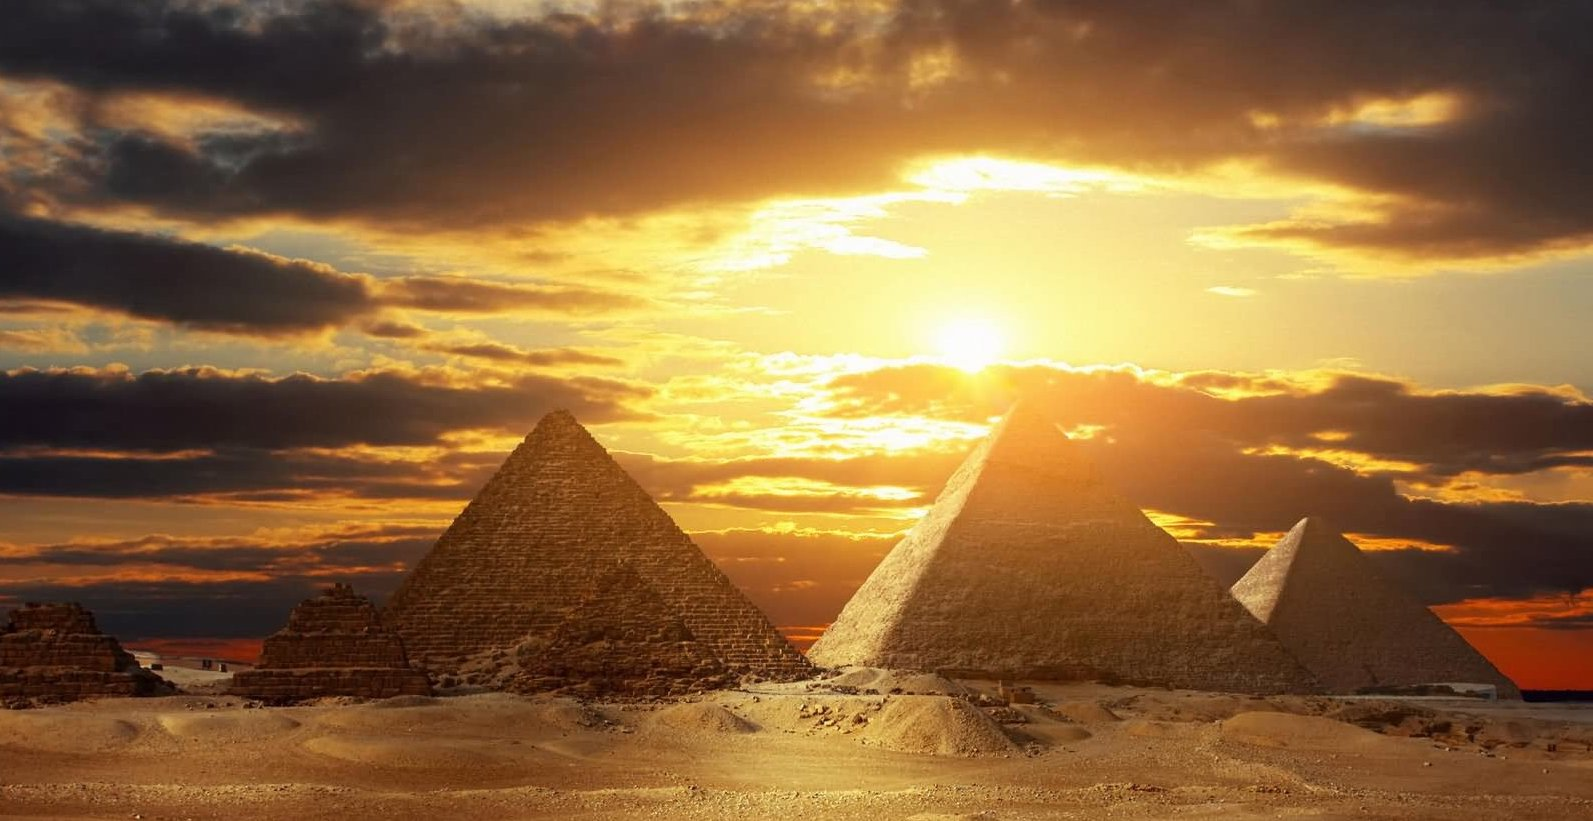 Pirâmides da 4ª dinastia